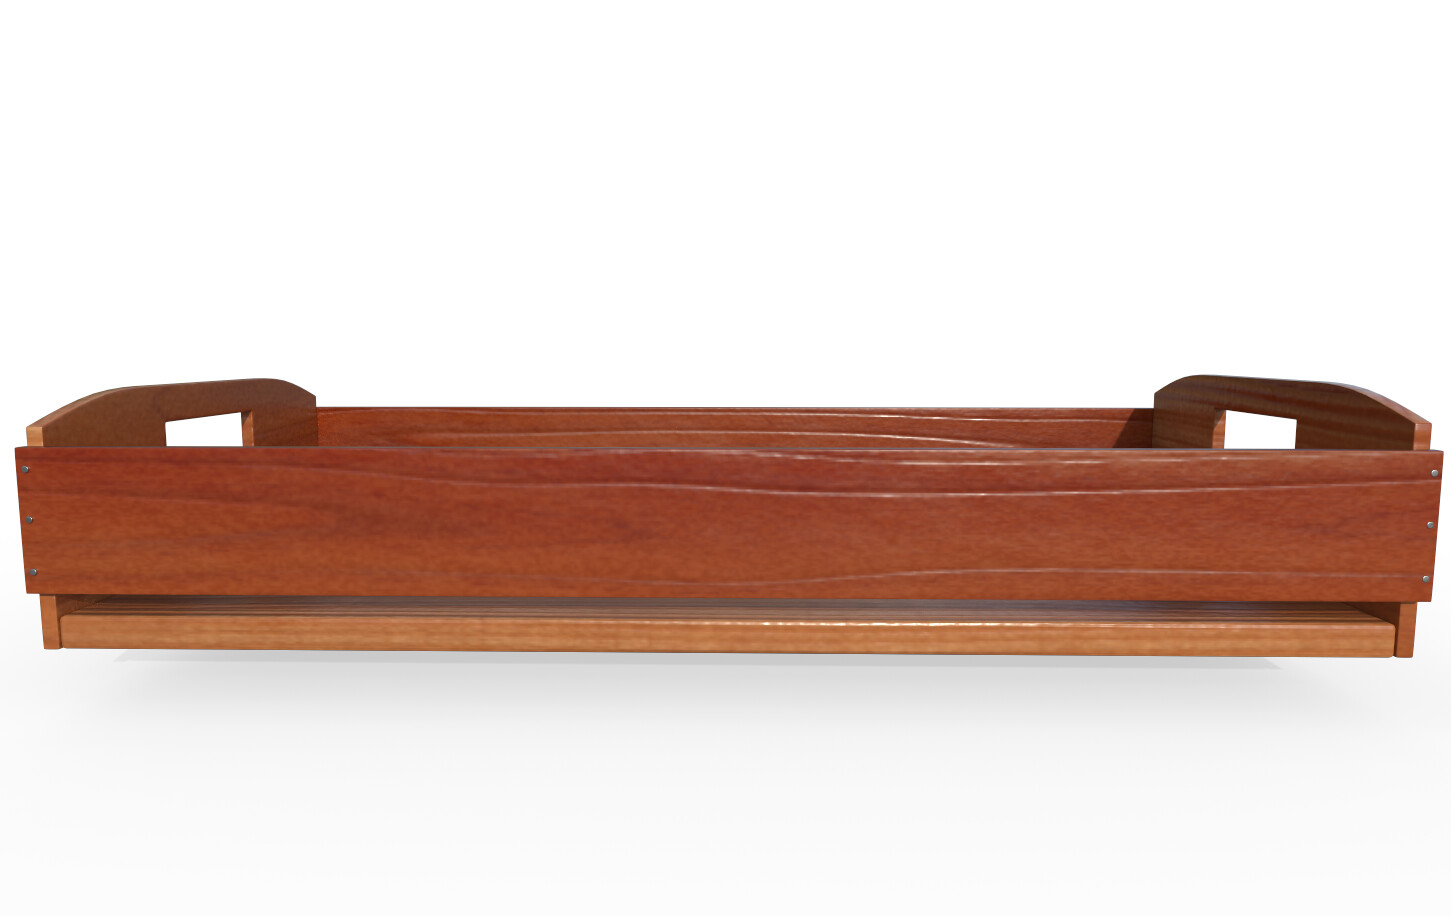 Joseph moniz tray1c